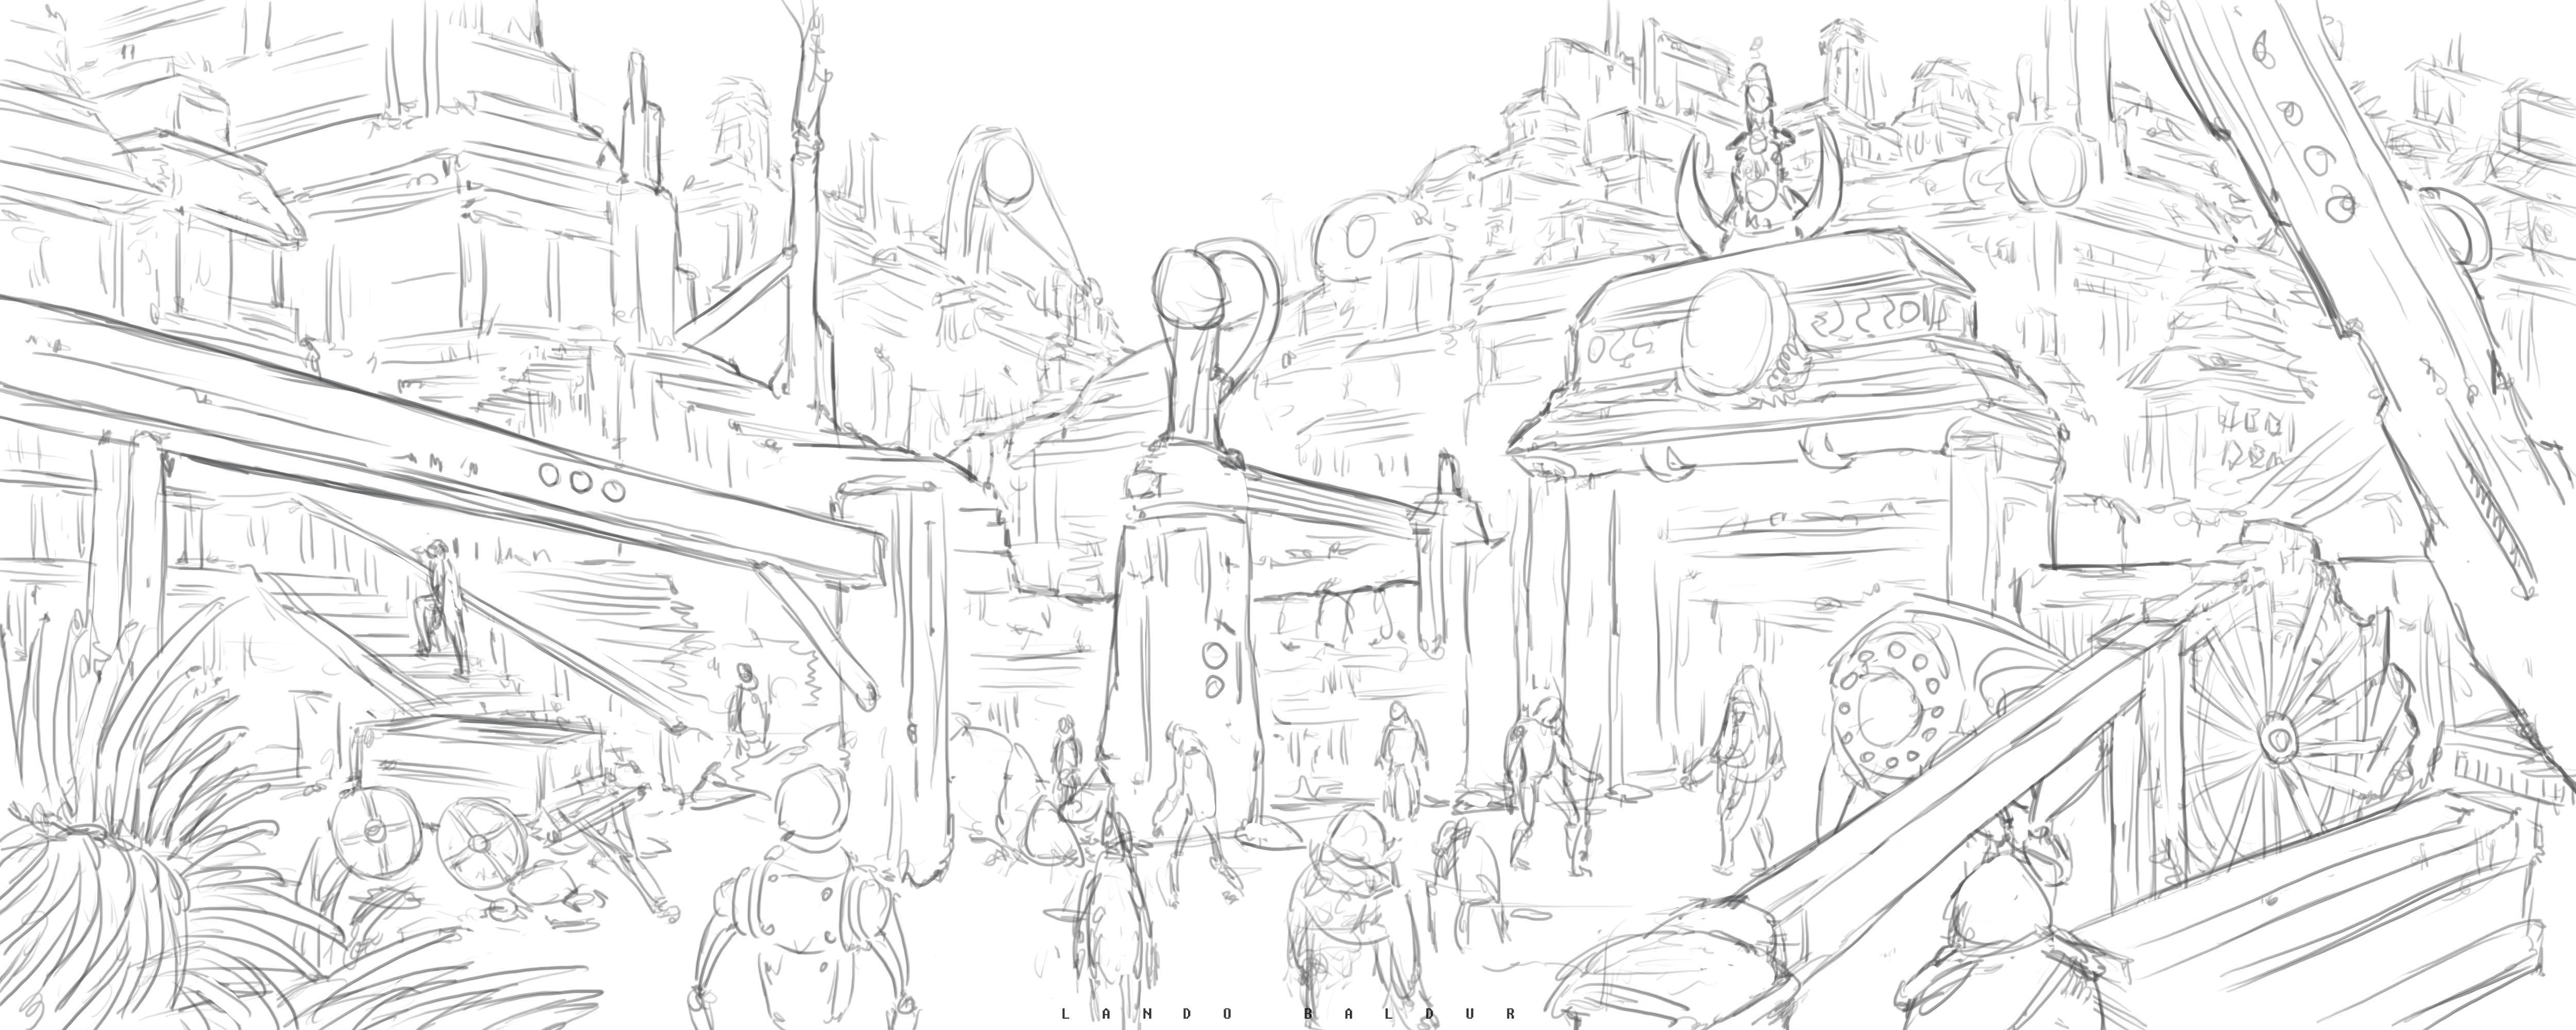 5000x2000 Scifi City Entrance Drawing Process 24 By Landobaldur